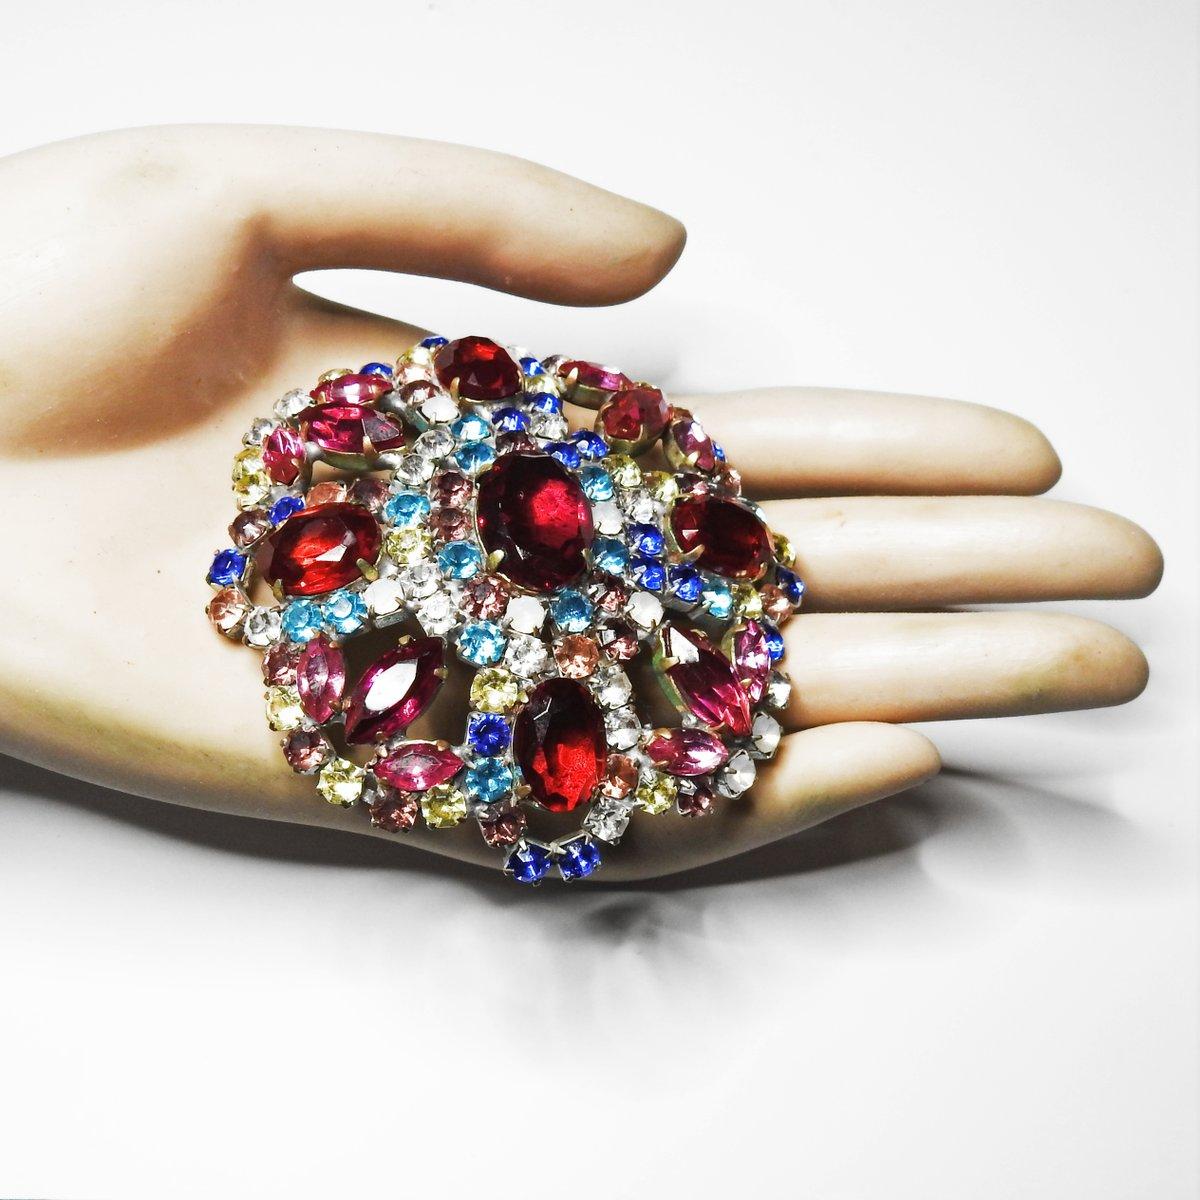 💜   #glassworks #broochaddict #brooche #etsy #jewelryinspiration #jewelrystyle #jewelrystore #jewelryshop #oneofakindjewelry #jewelrylovers #luxurylifestyle #jewels #giftidea #perfectgift